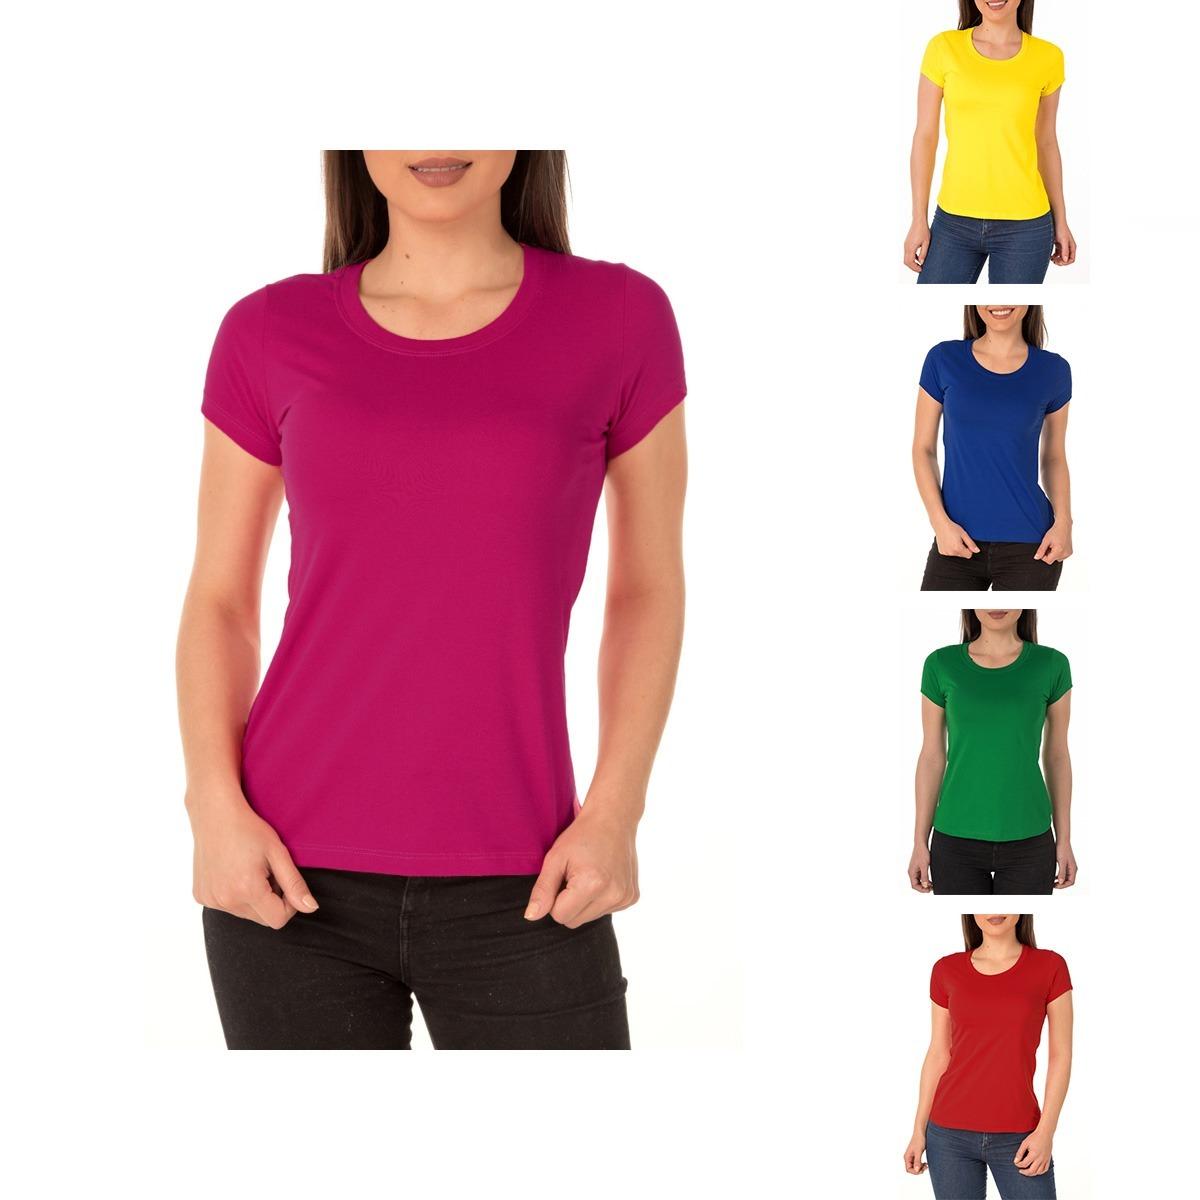 52ae6abace Kit C  7 Camiseta Feminina Baby Look Colorida P  Sublimação - R  118 ...